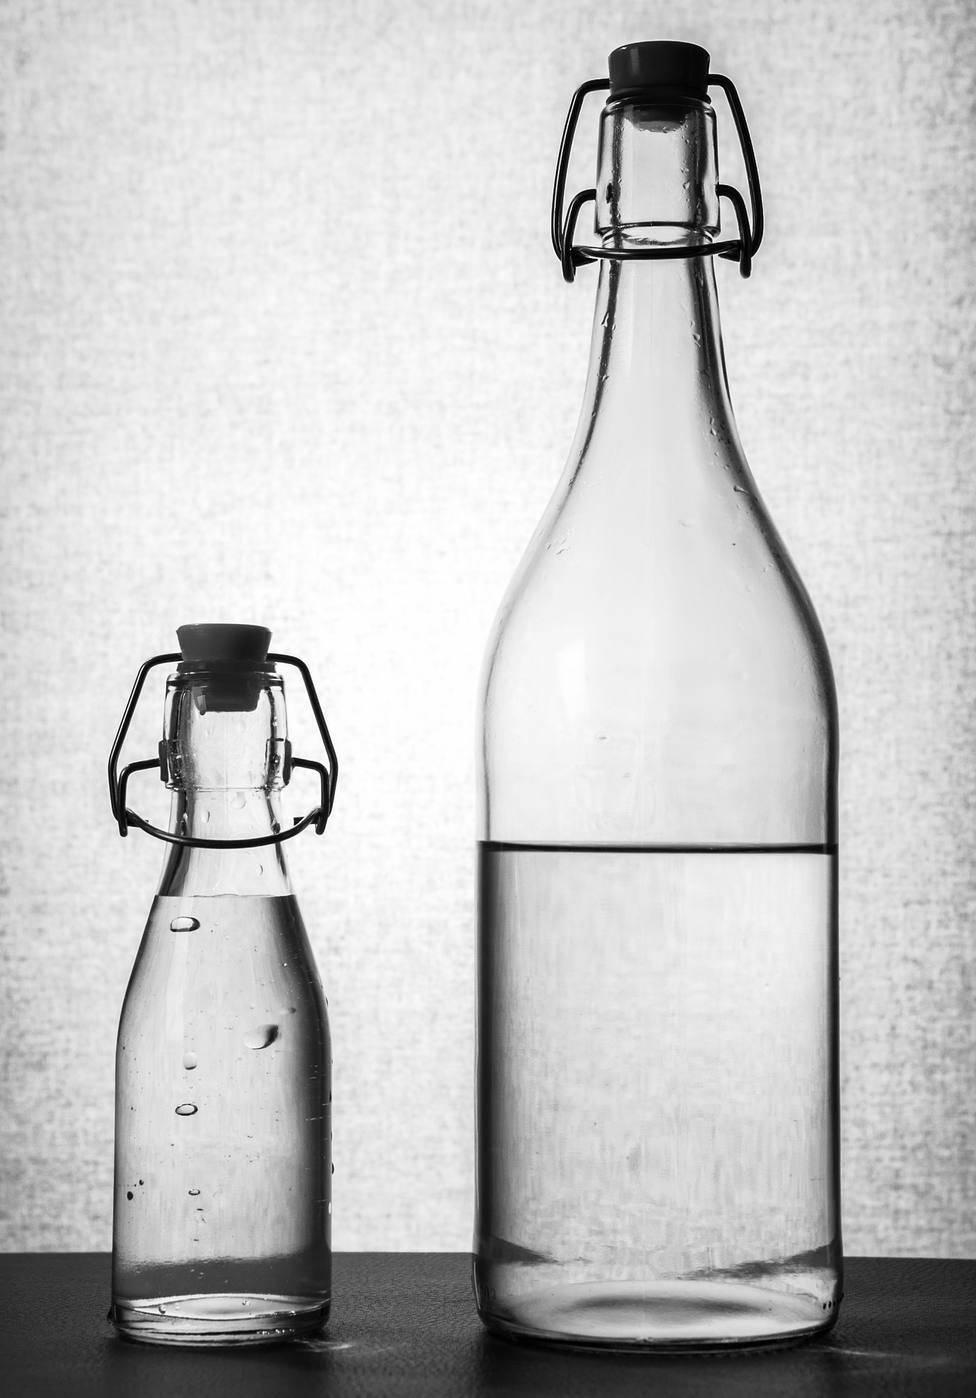 ctv-sib-water-bottle-2001912 1920